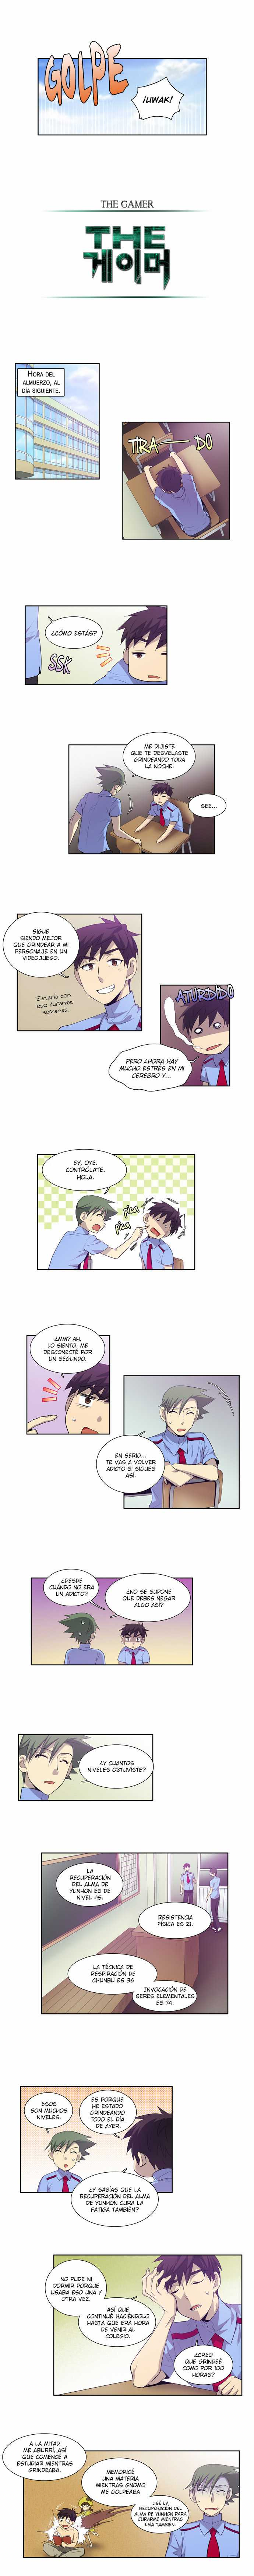 http://c5.ninemanga.com/es_manga/61/1725/364515/149db112c73925338d37d7deadb1197e.jpg Page 4